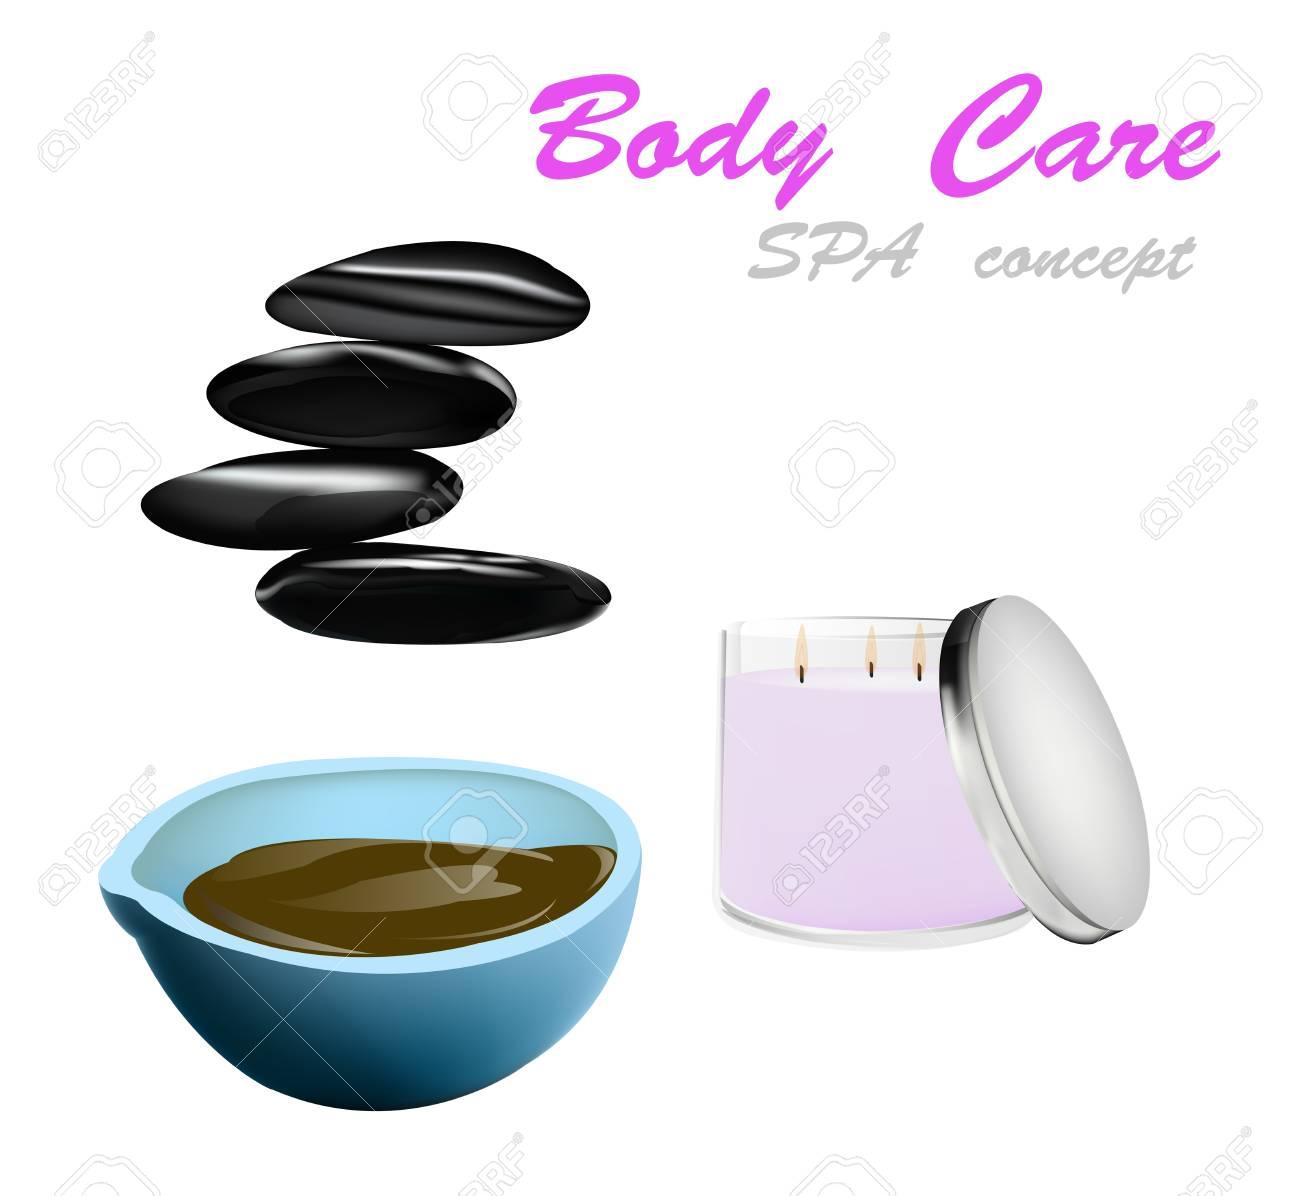 Body care The spa procedure concept Stock Vector - 16977949